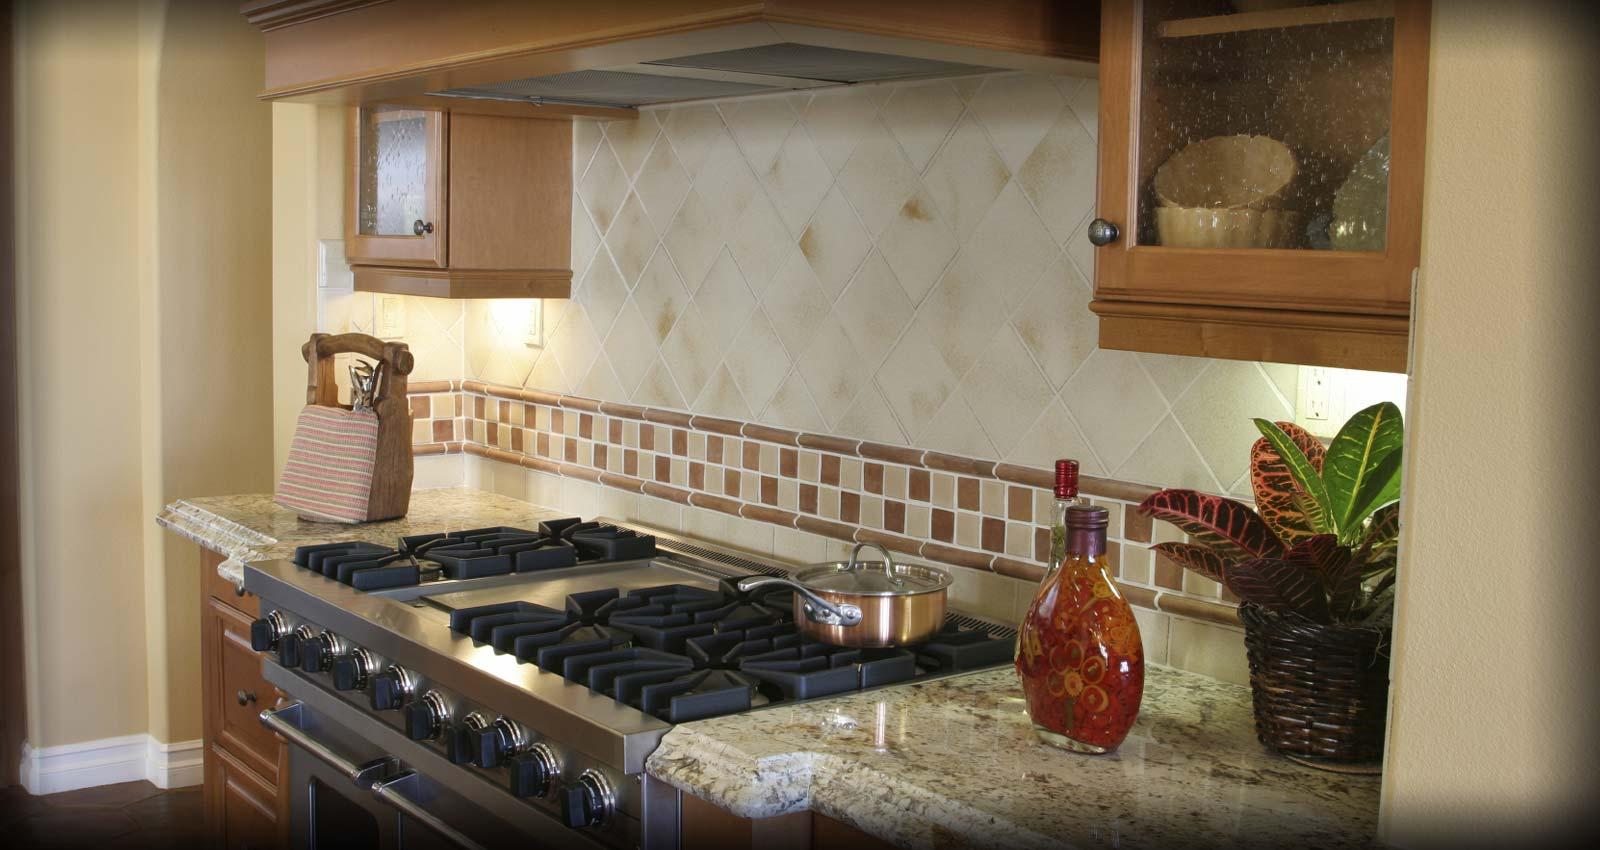 Zanimljive ideje za kuhinjske pločice  Uredite Dom